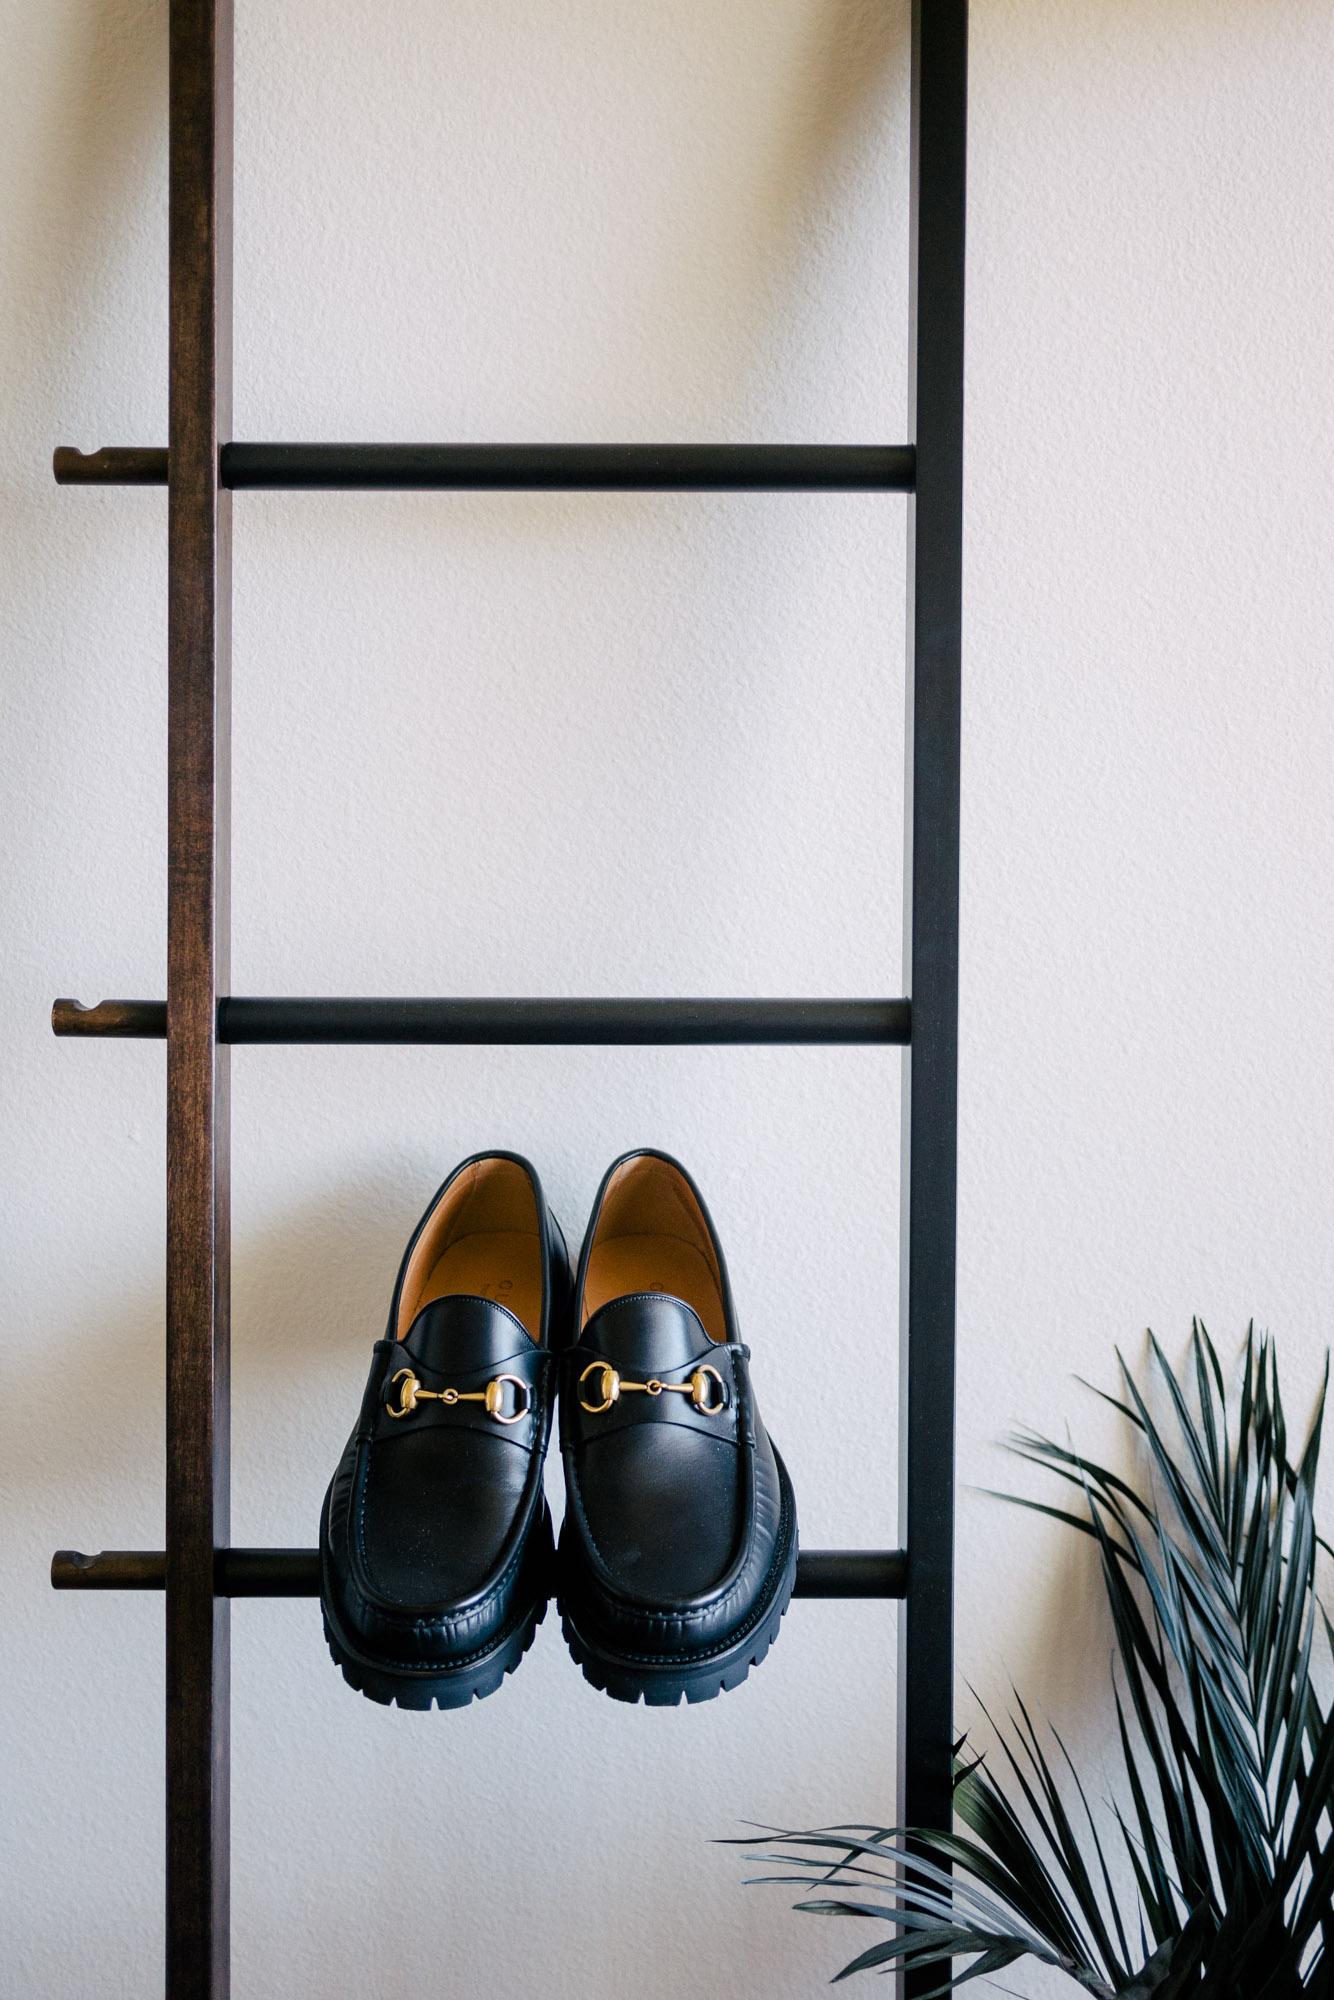 mybelonging-gucci-horsebit-black-loafers-menswear-mens-shoes-luxury-designer-2.jpg